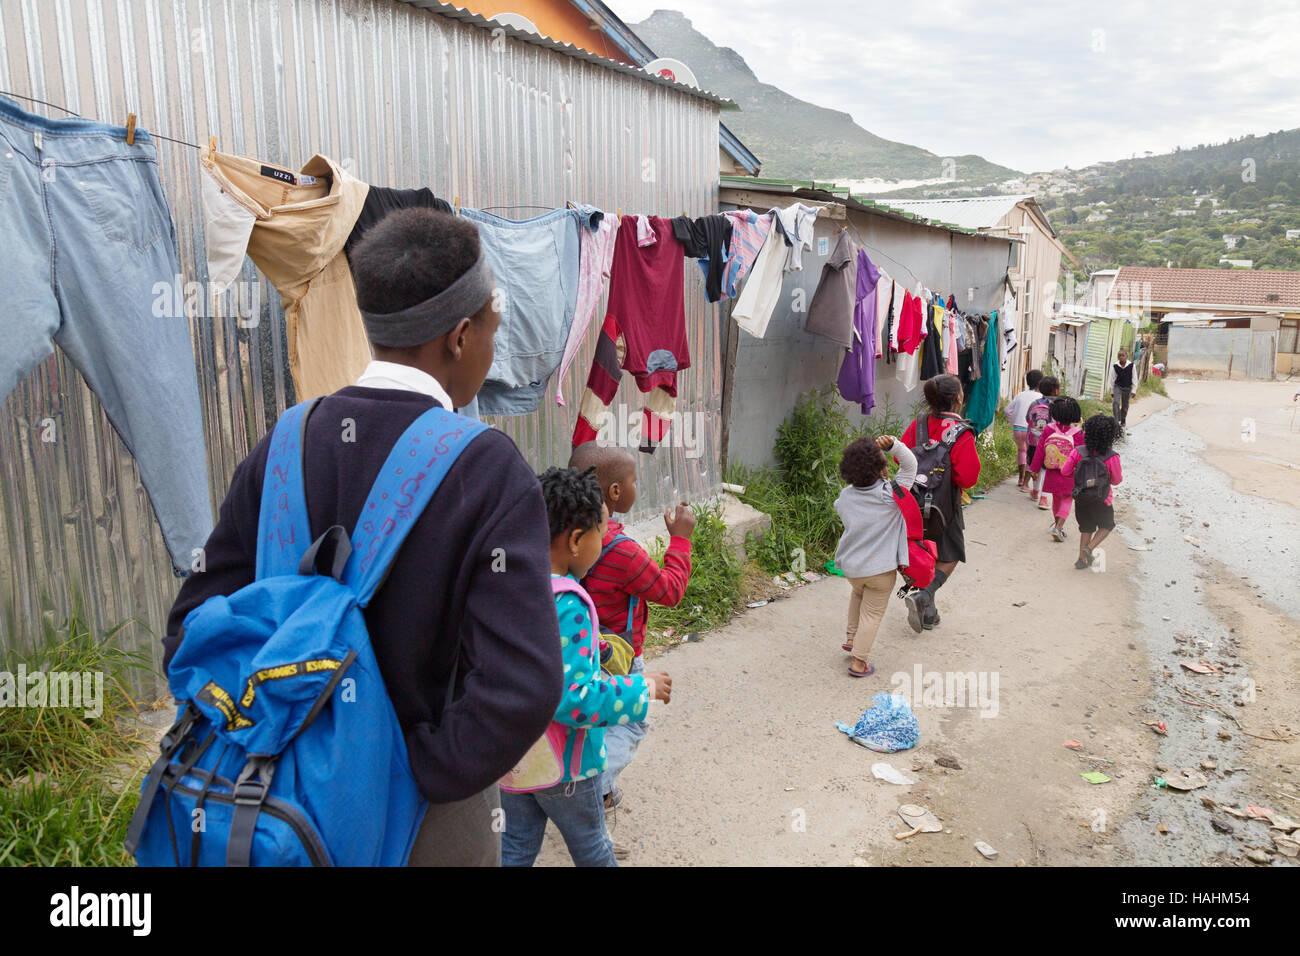 Street scene, Imizamo Yethu township, Hout Bay, Cape Town, South Africa Stock Photo